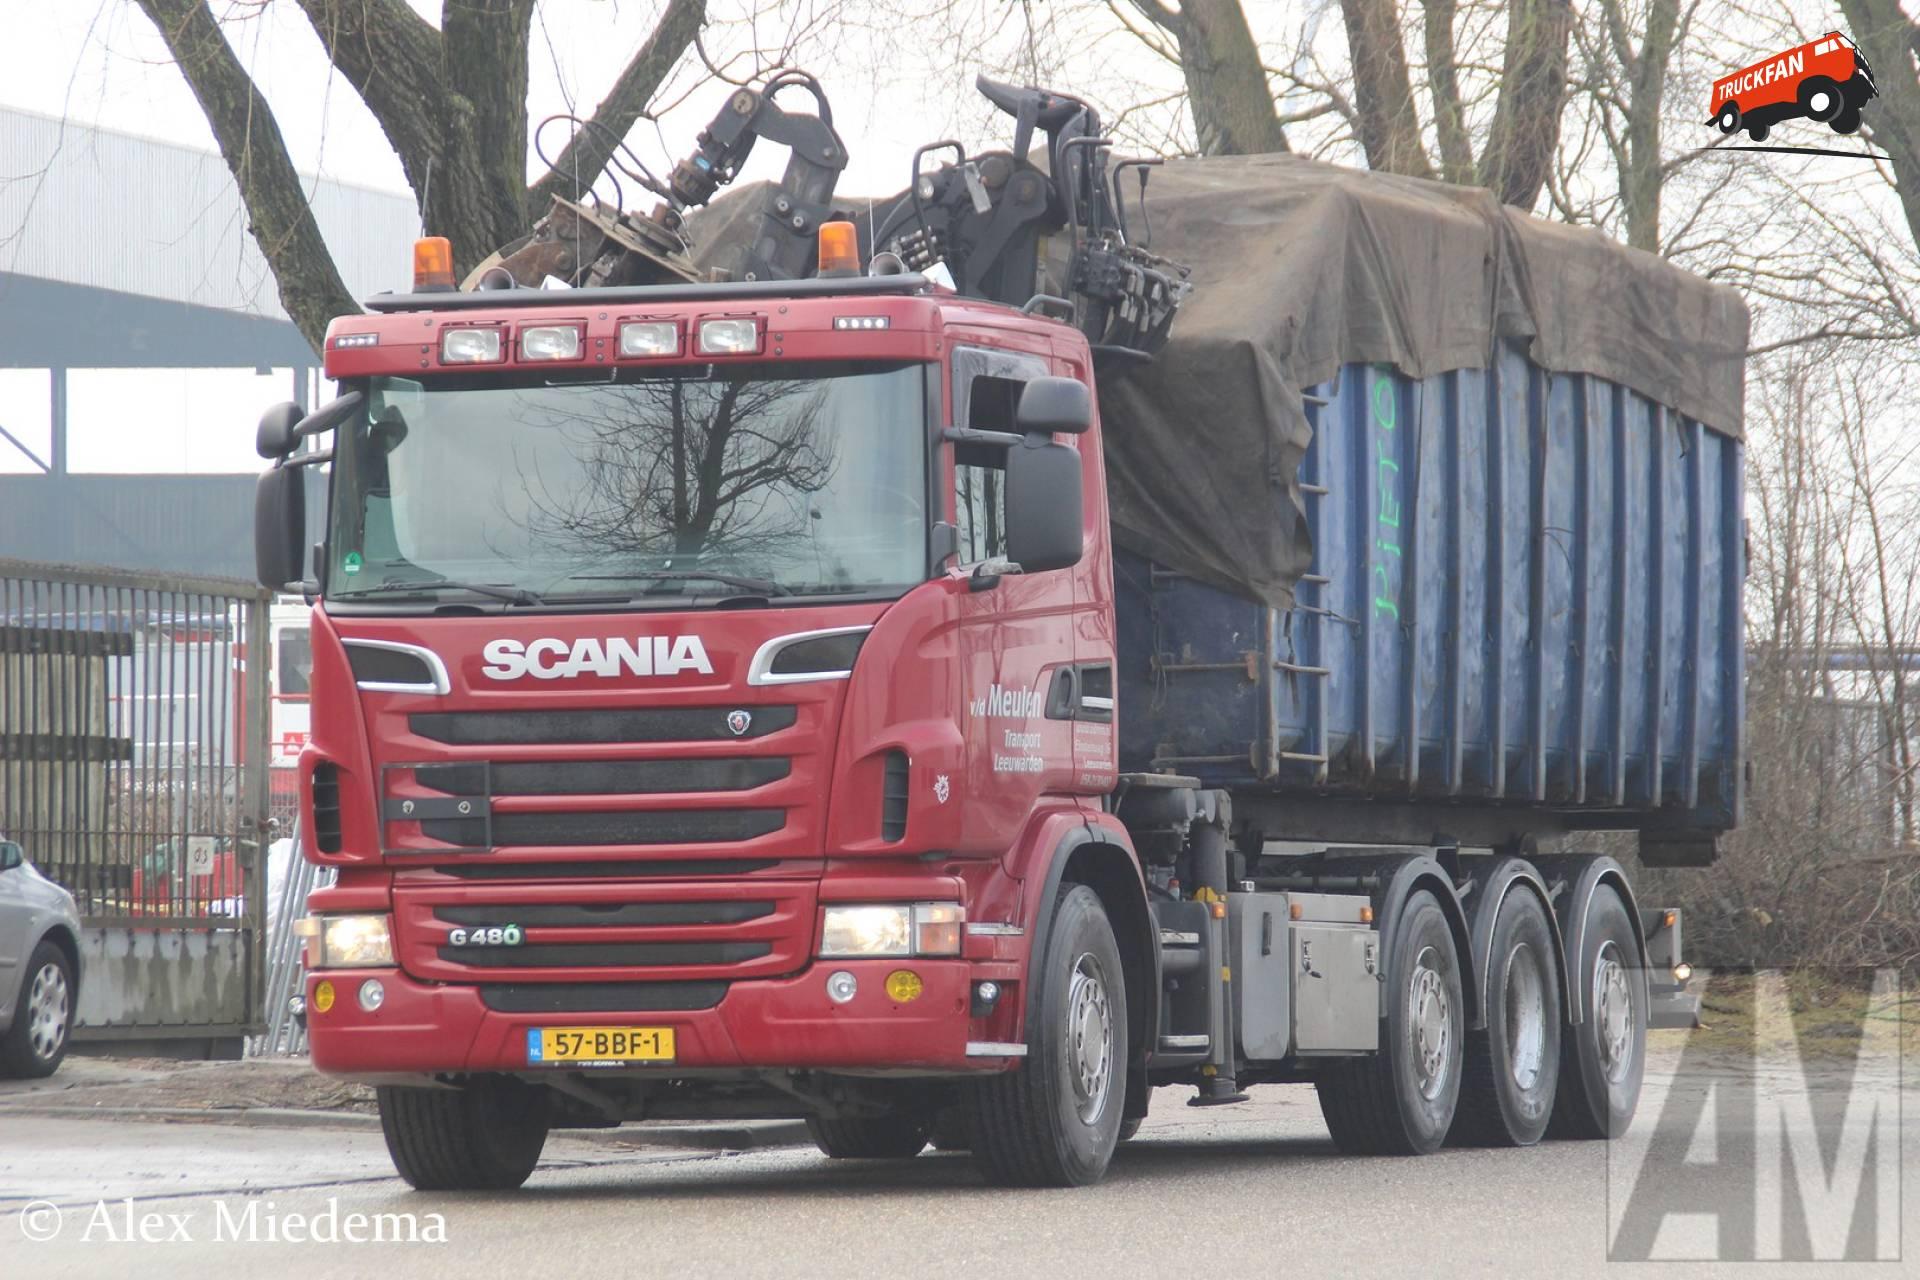 Scania G480